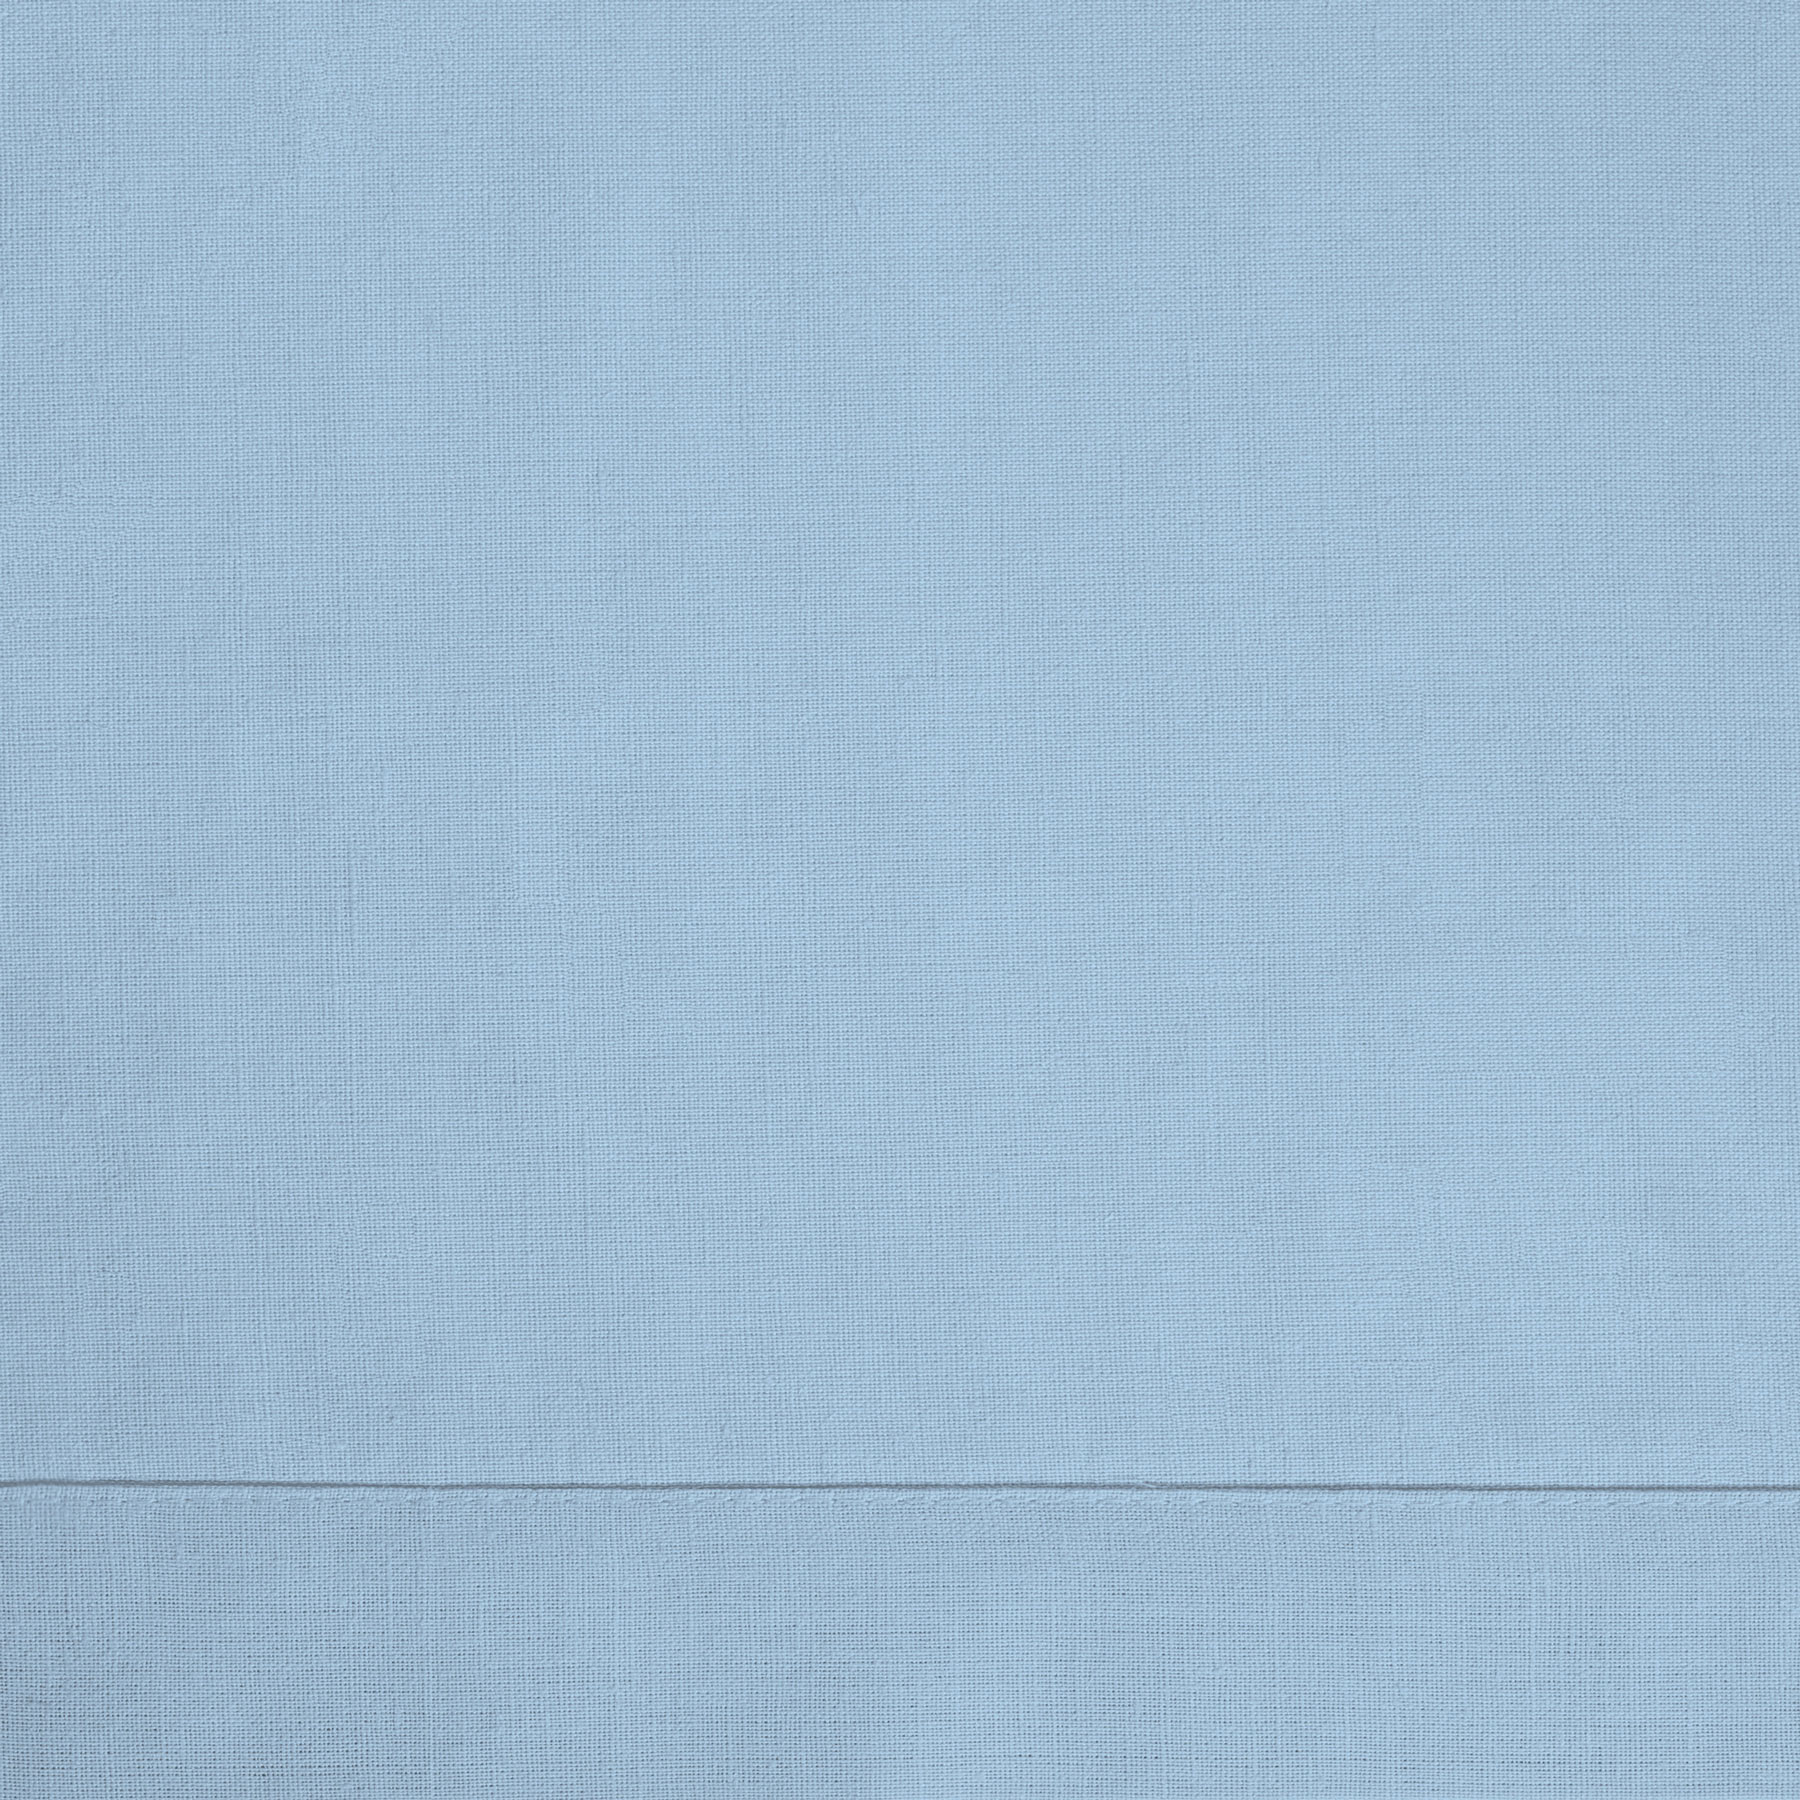 bed sheets texture. BED SHEET \u003cbr /\u003elight Blue Bed Sheets Texture